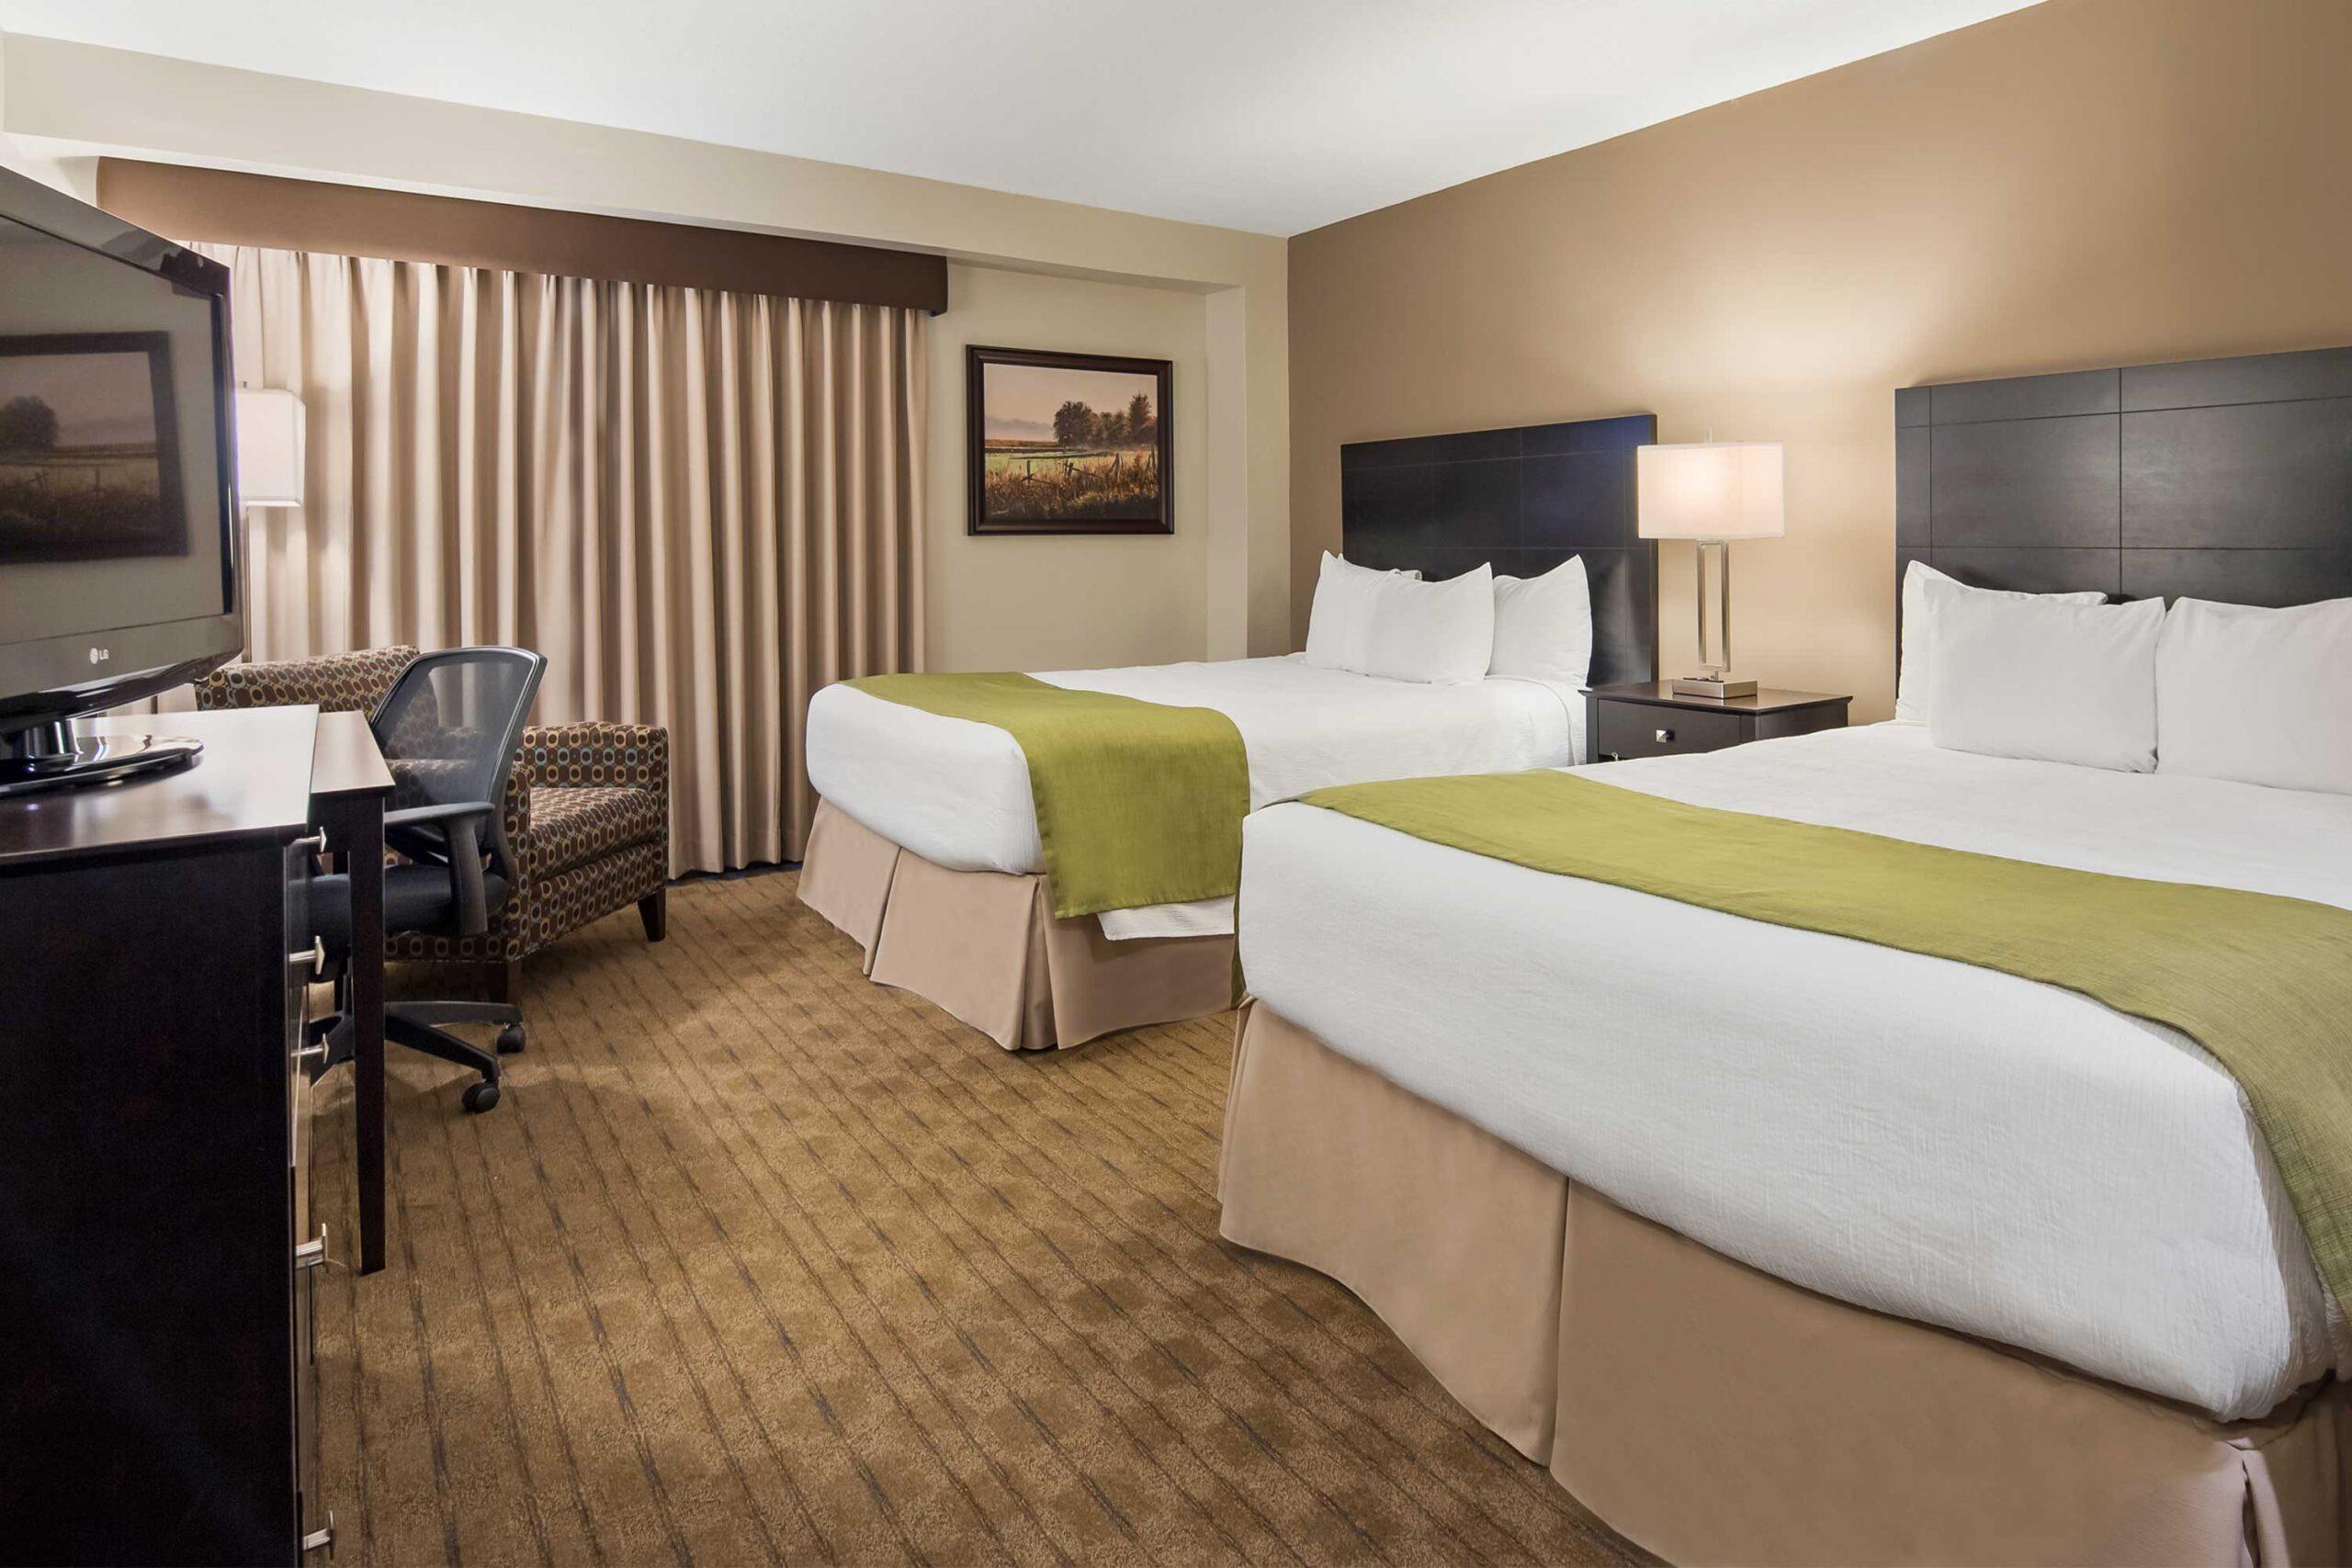 88 Rooms & Suites